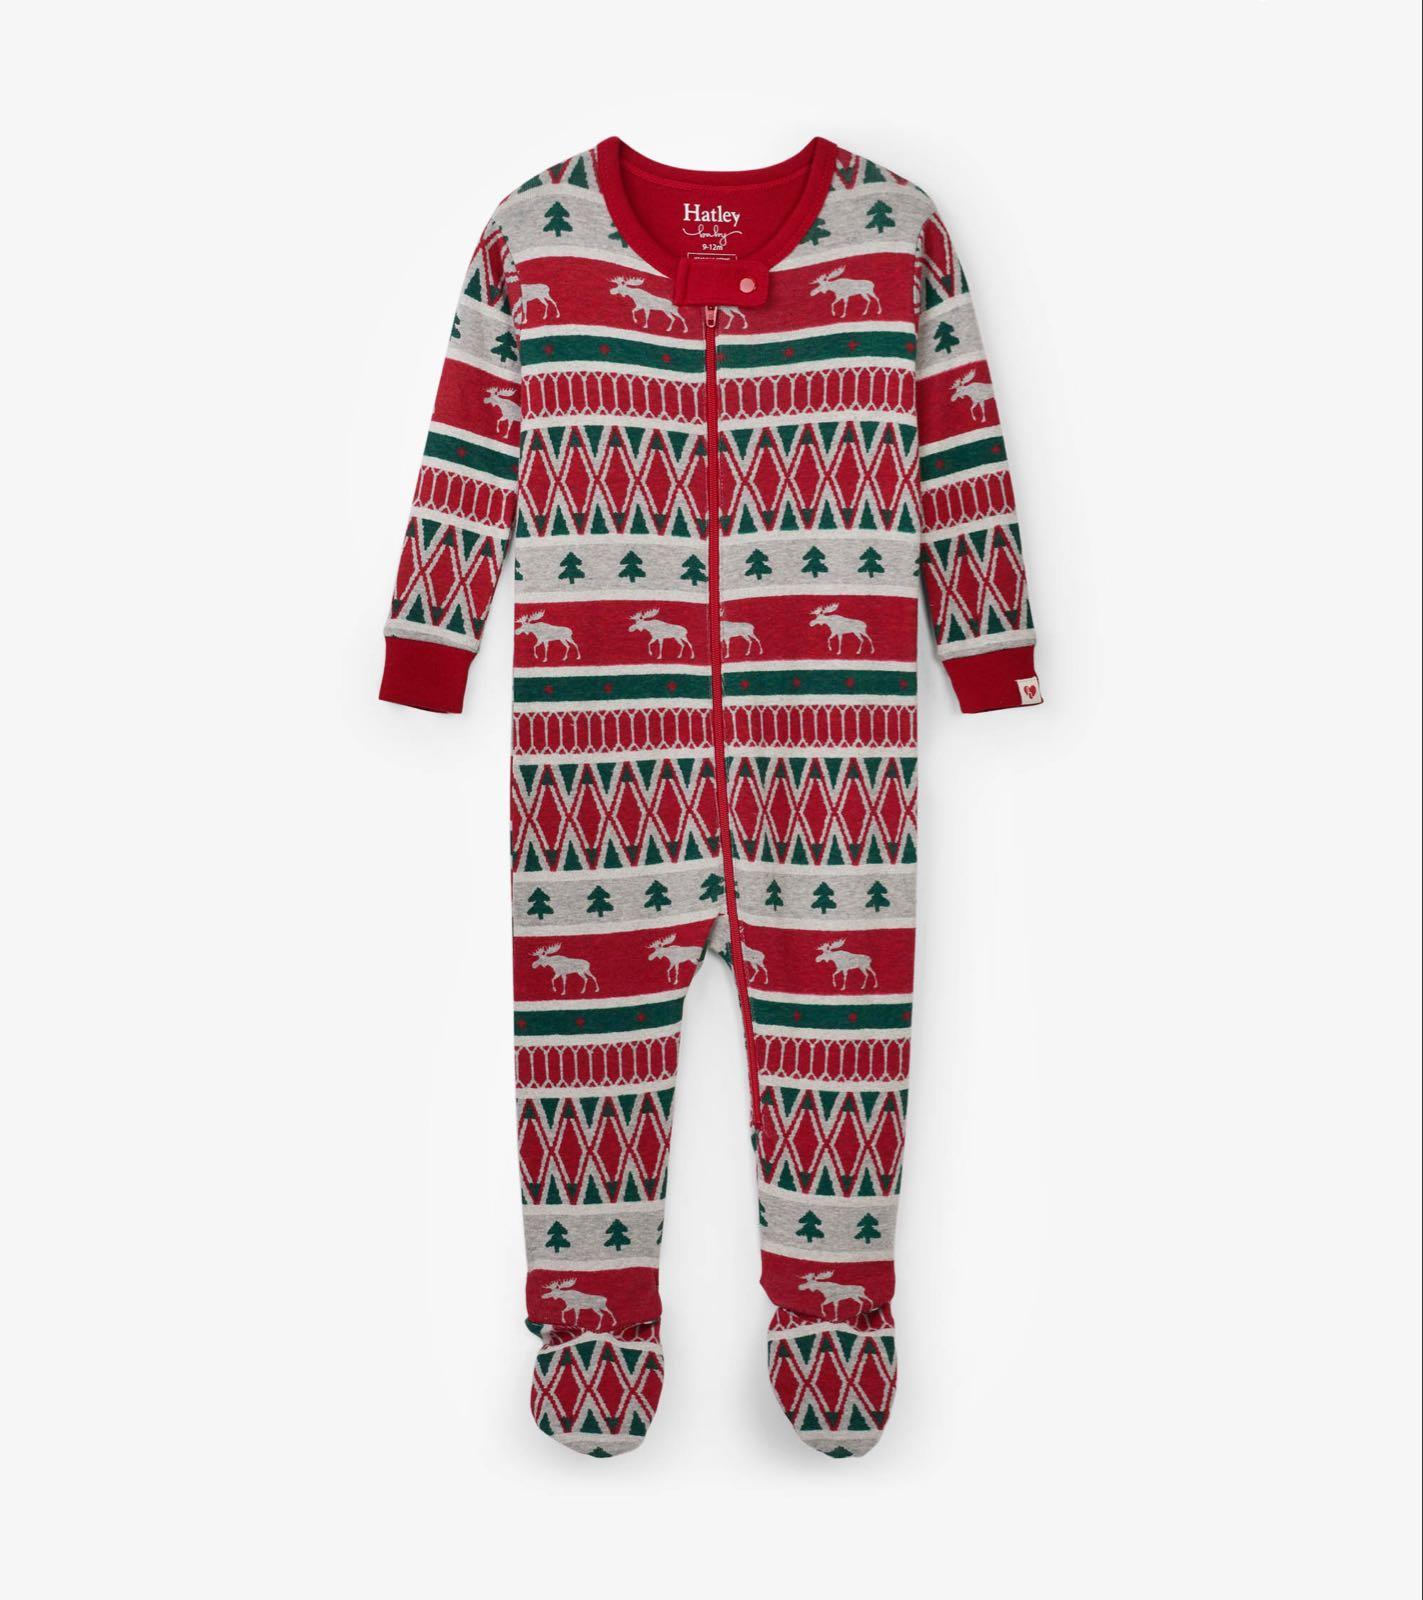 Hatley Winter Fair Isle Sleepsuit